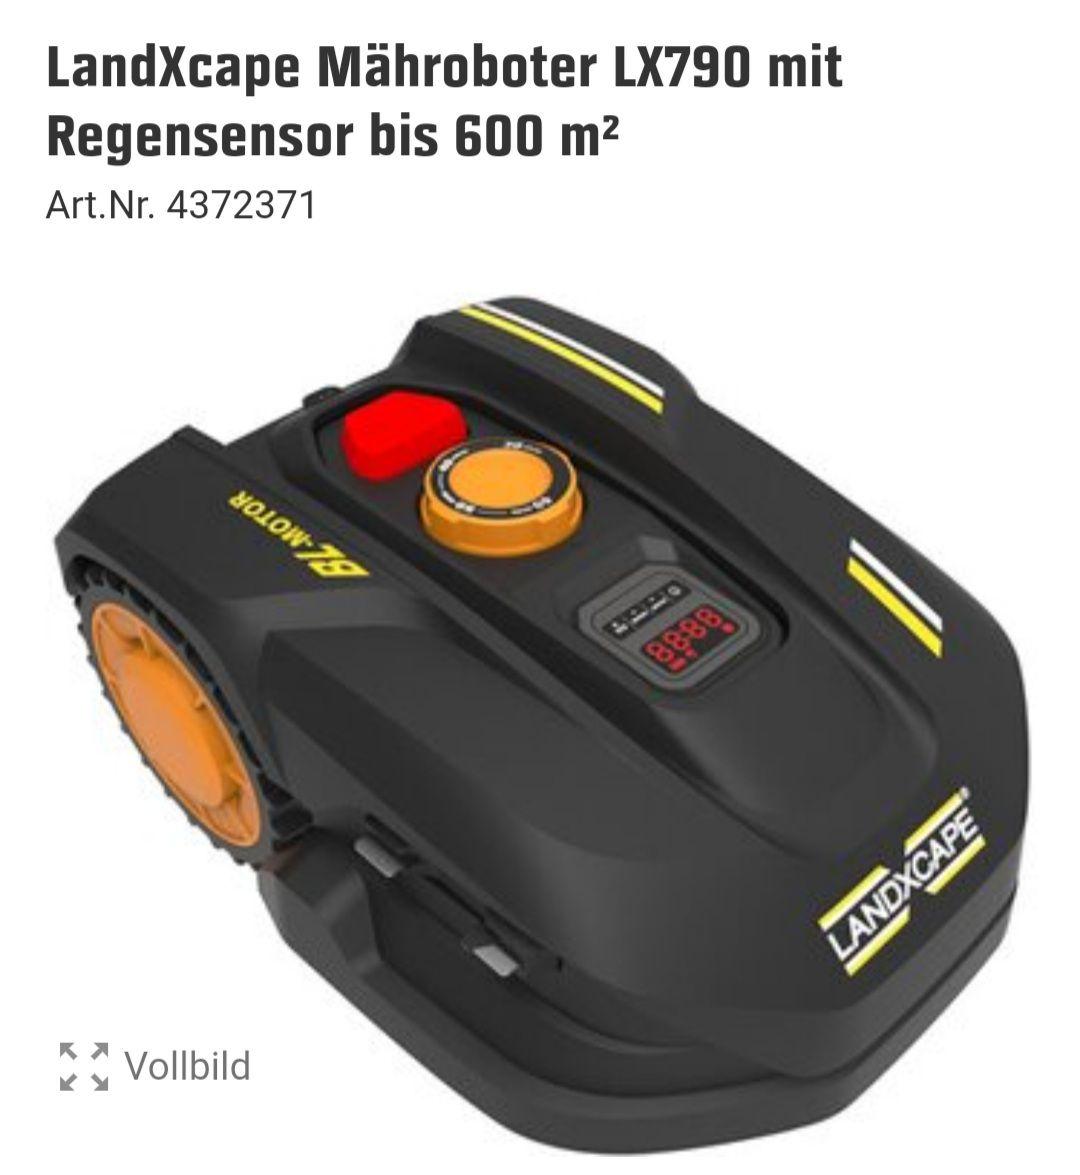 LandXcape Mähroboter LX790 mit Regensensor bis 600 m² Art.Nr. 4372371 OBI Marktabholung